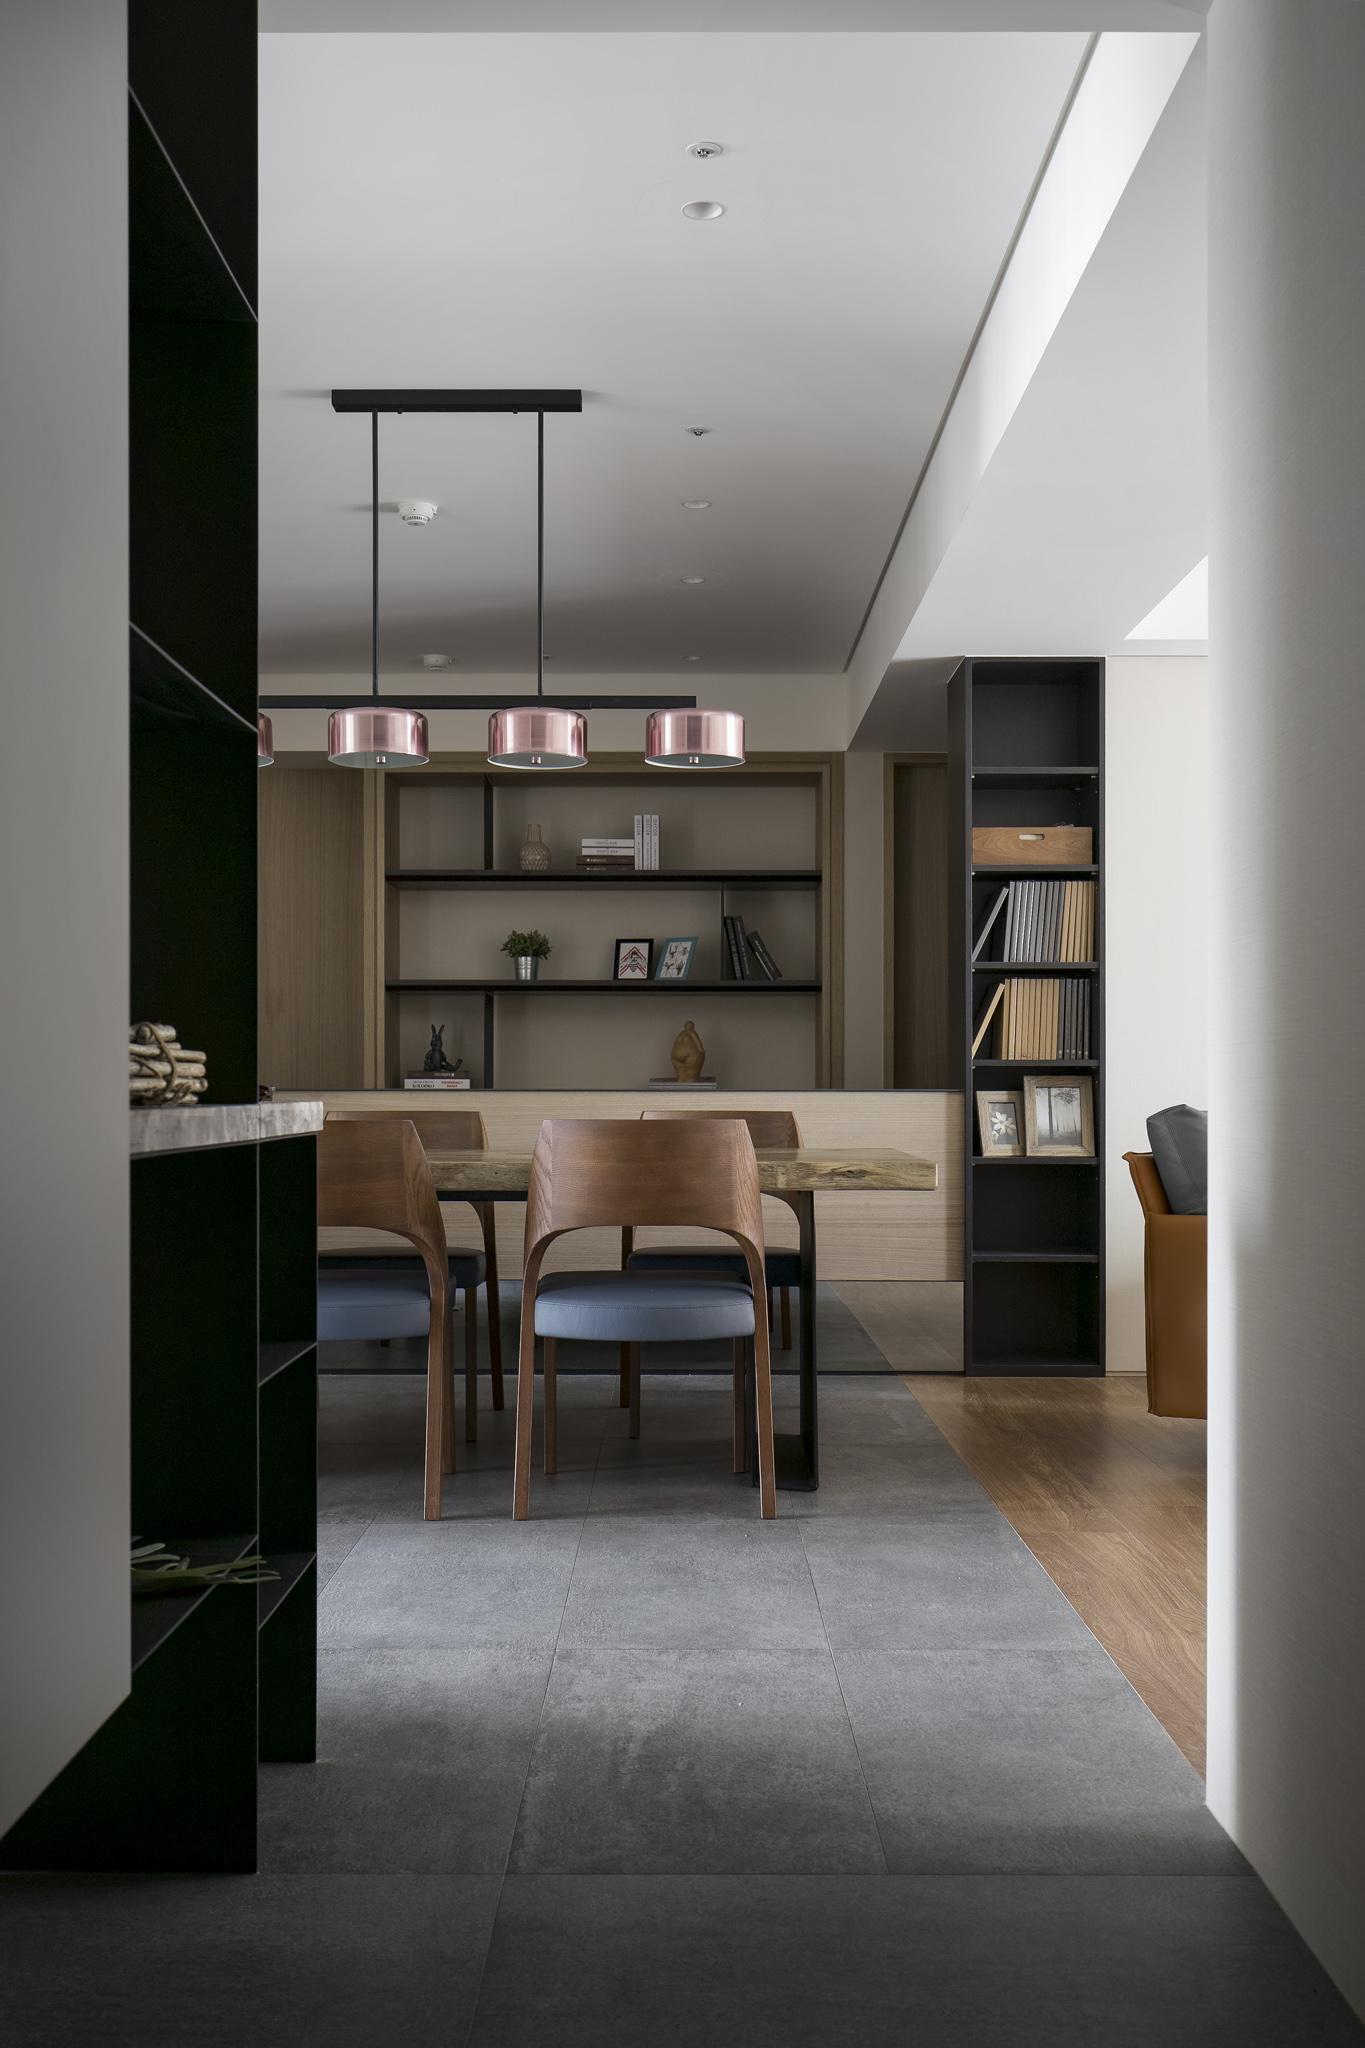 Interior Image 26